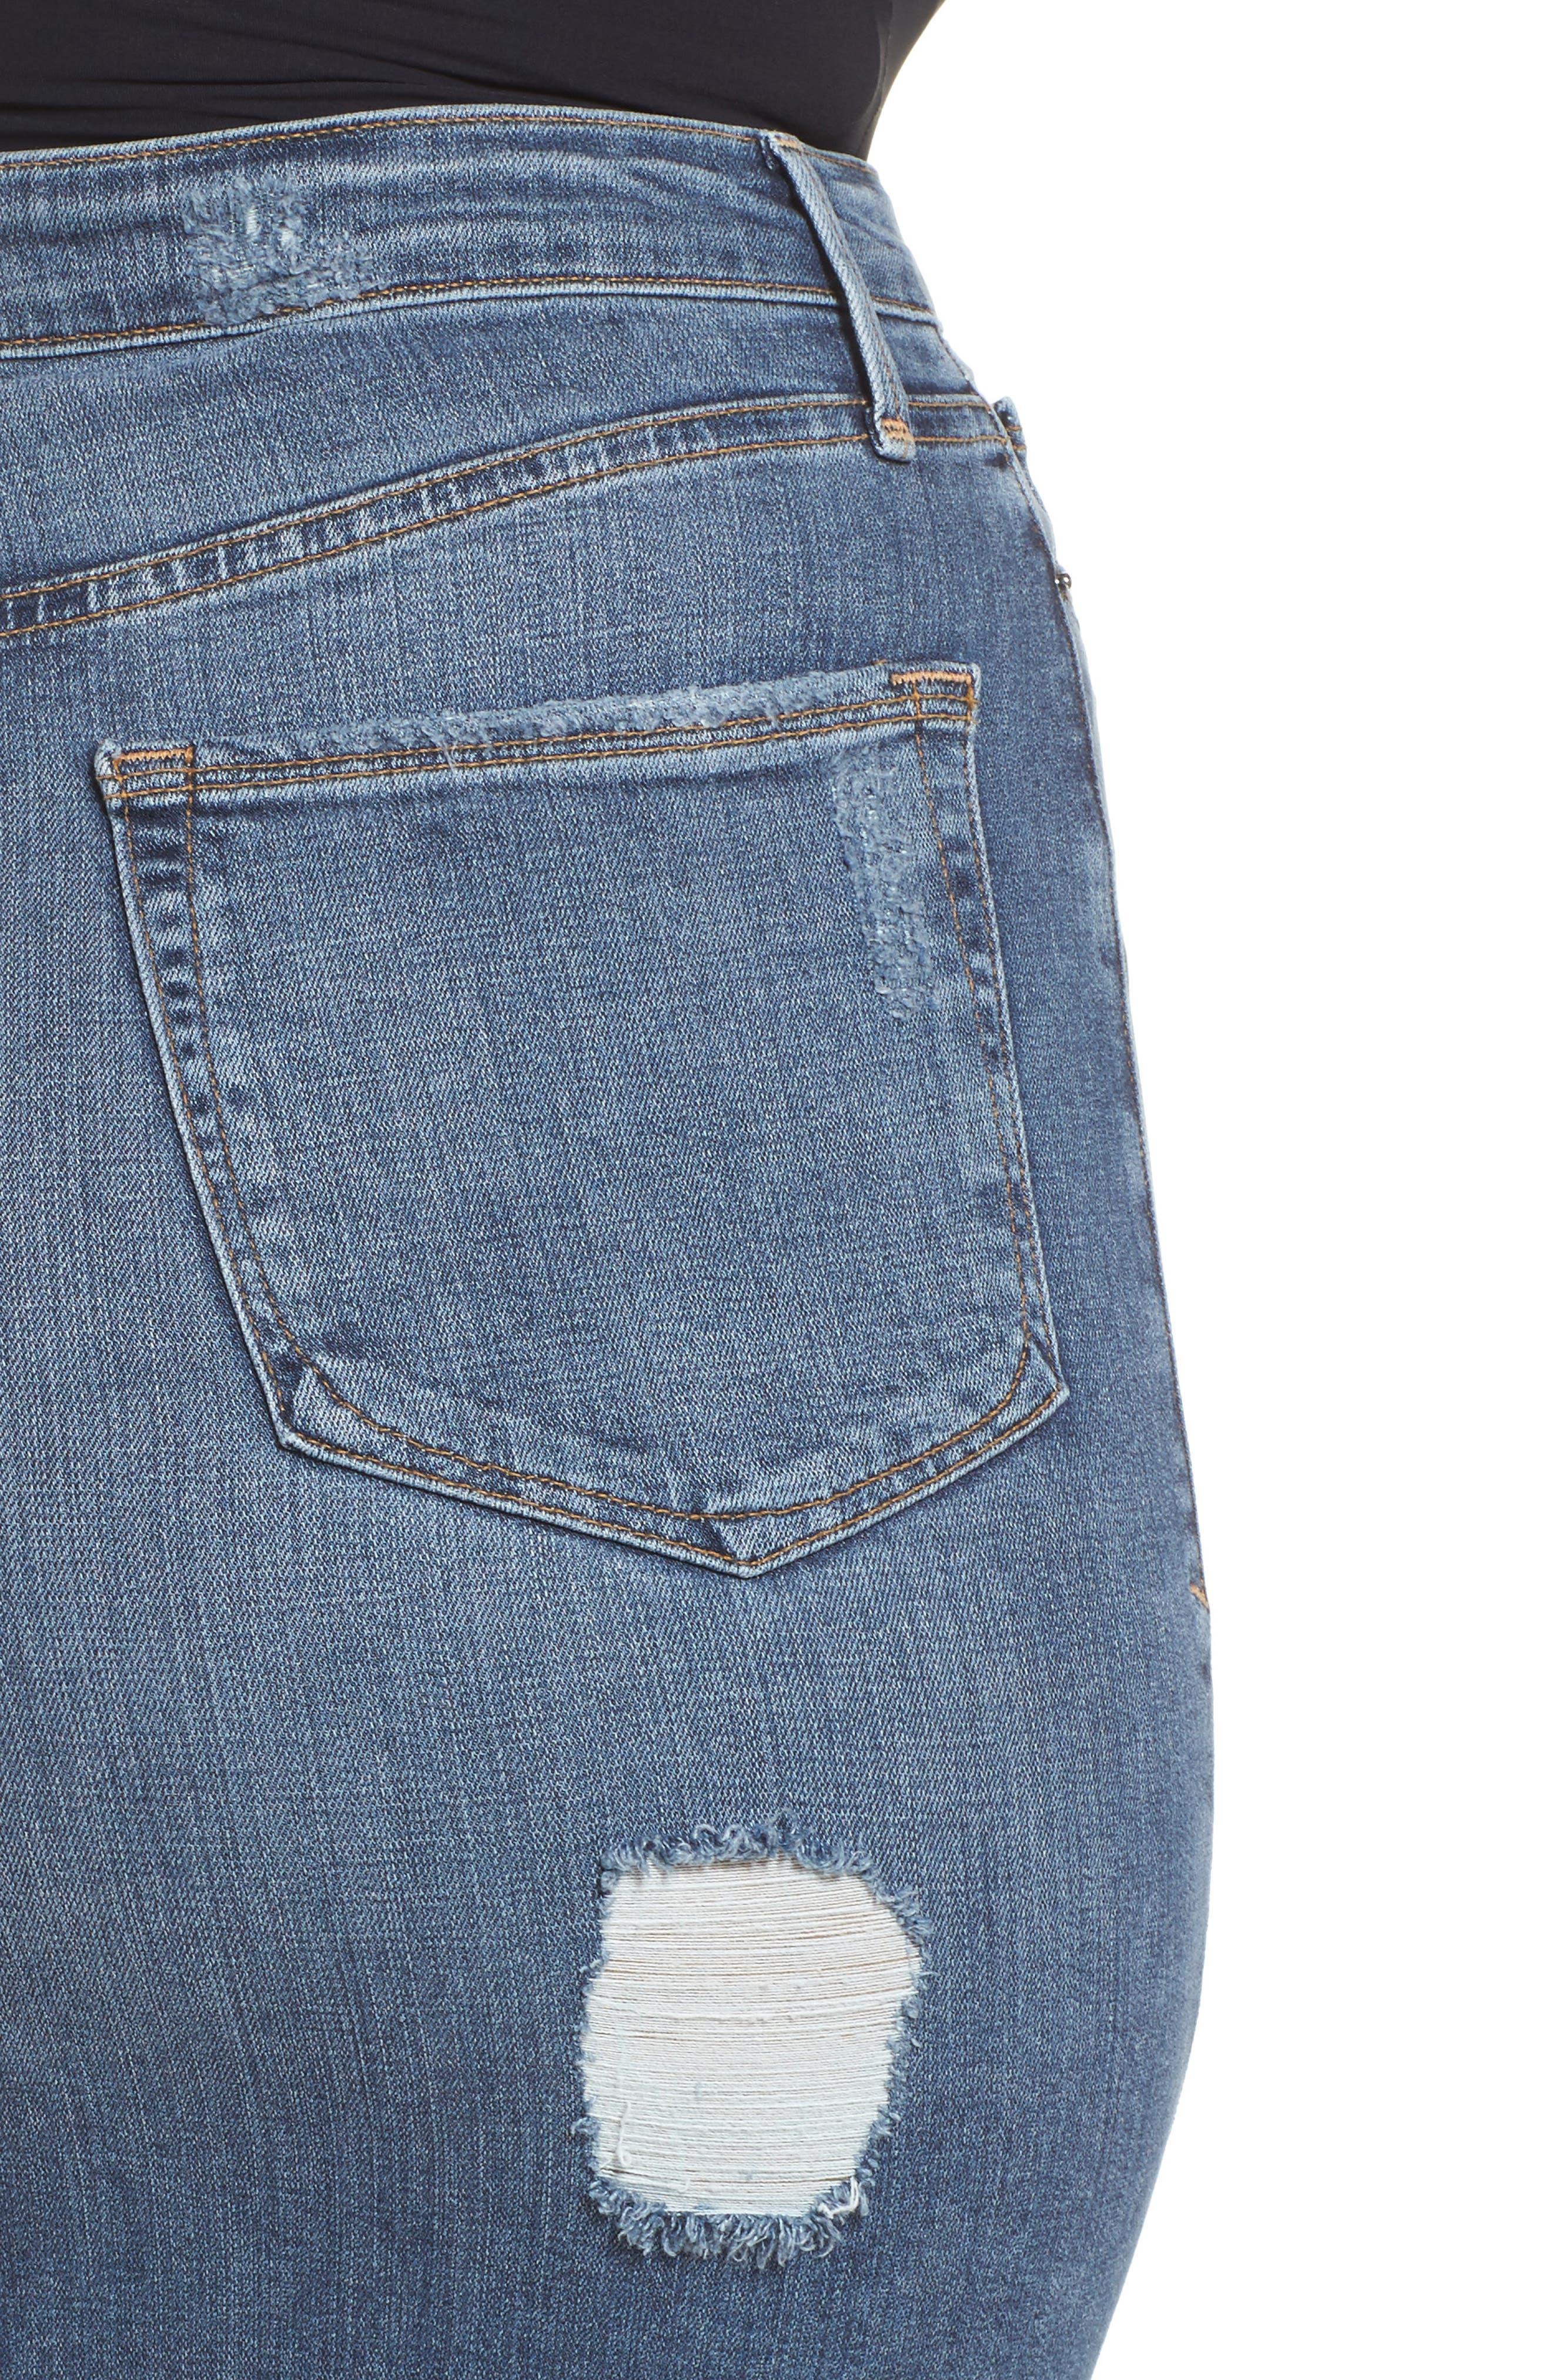 High Waist Denim Pencil Skirt,                             Alternate thumbnail 11, color,                             Blue 083